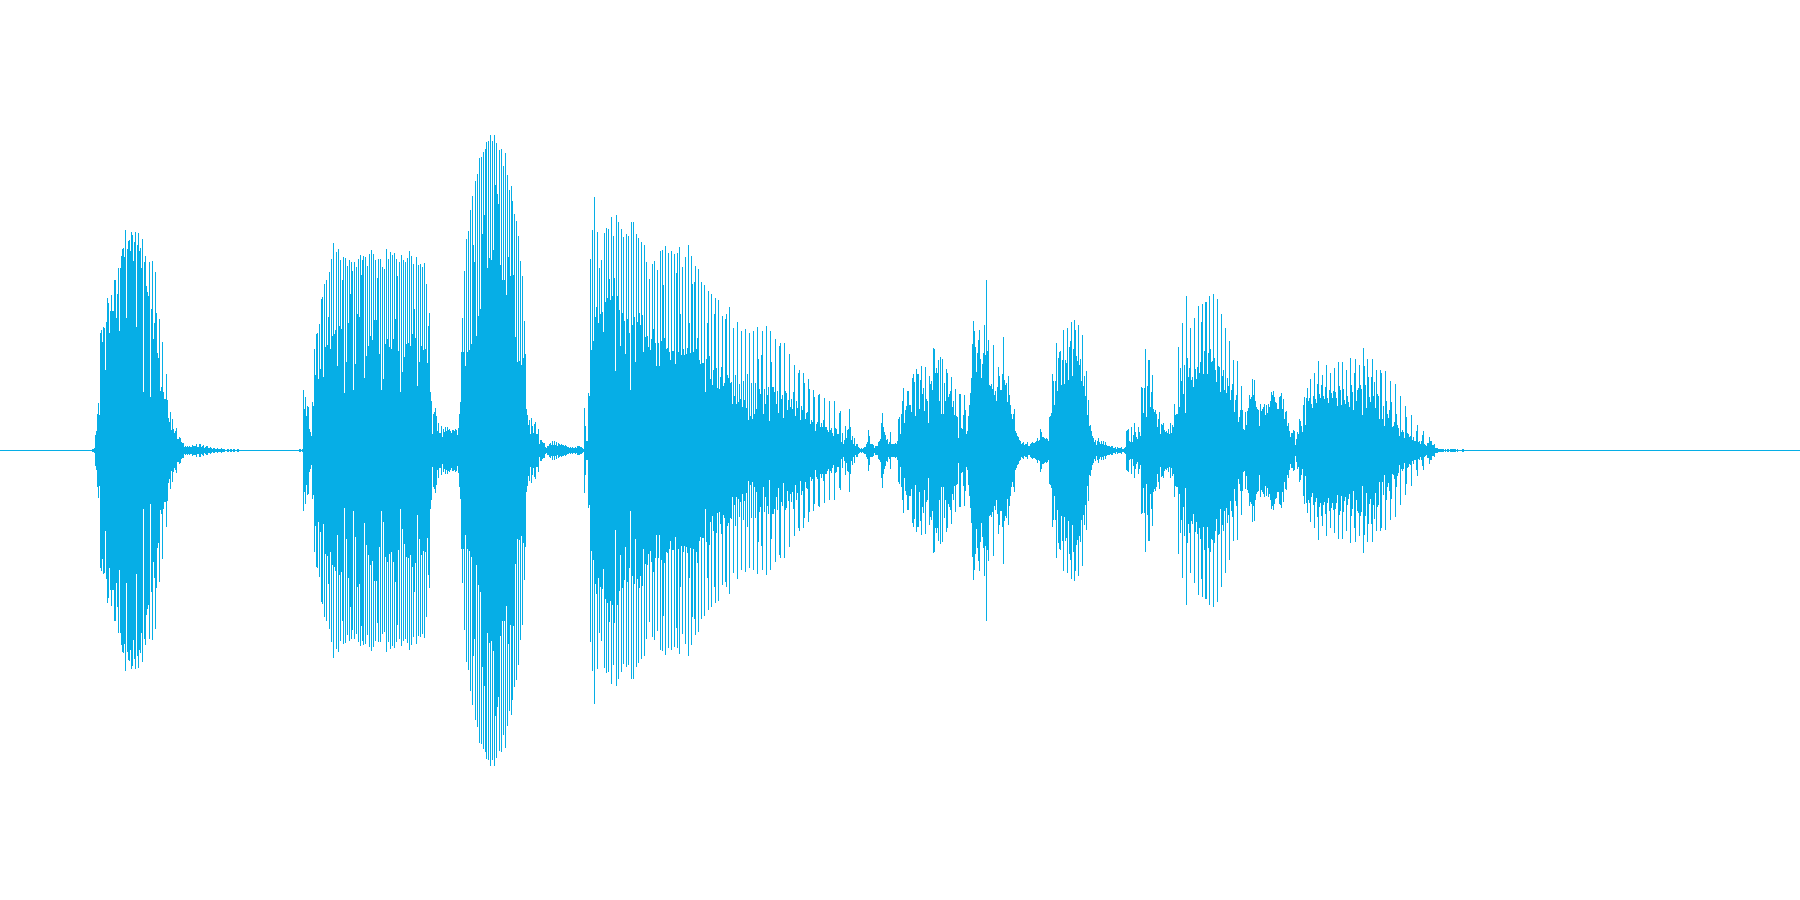 OKボタンを押してください_2の再生済みの波形